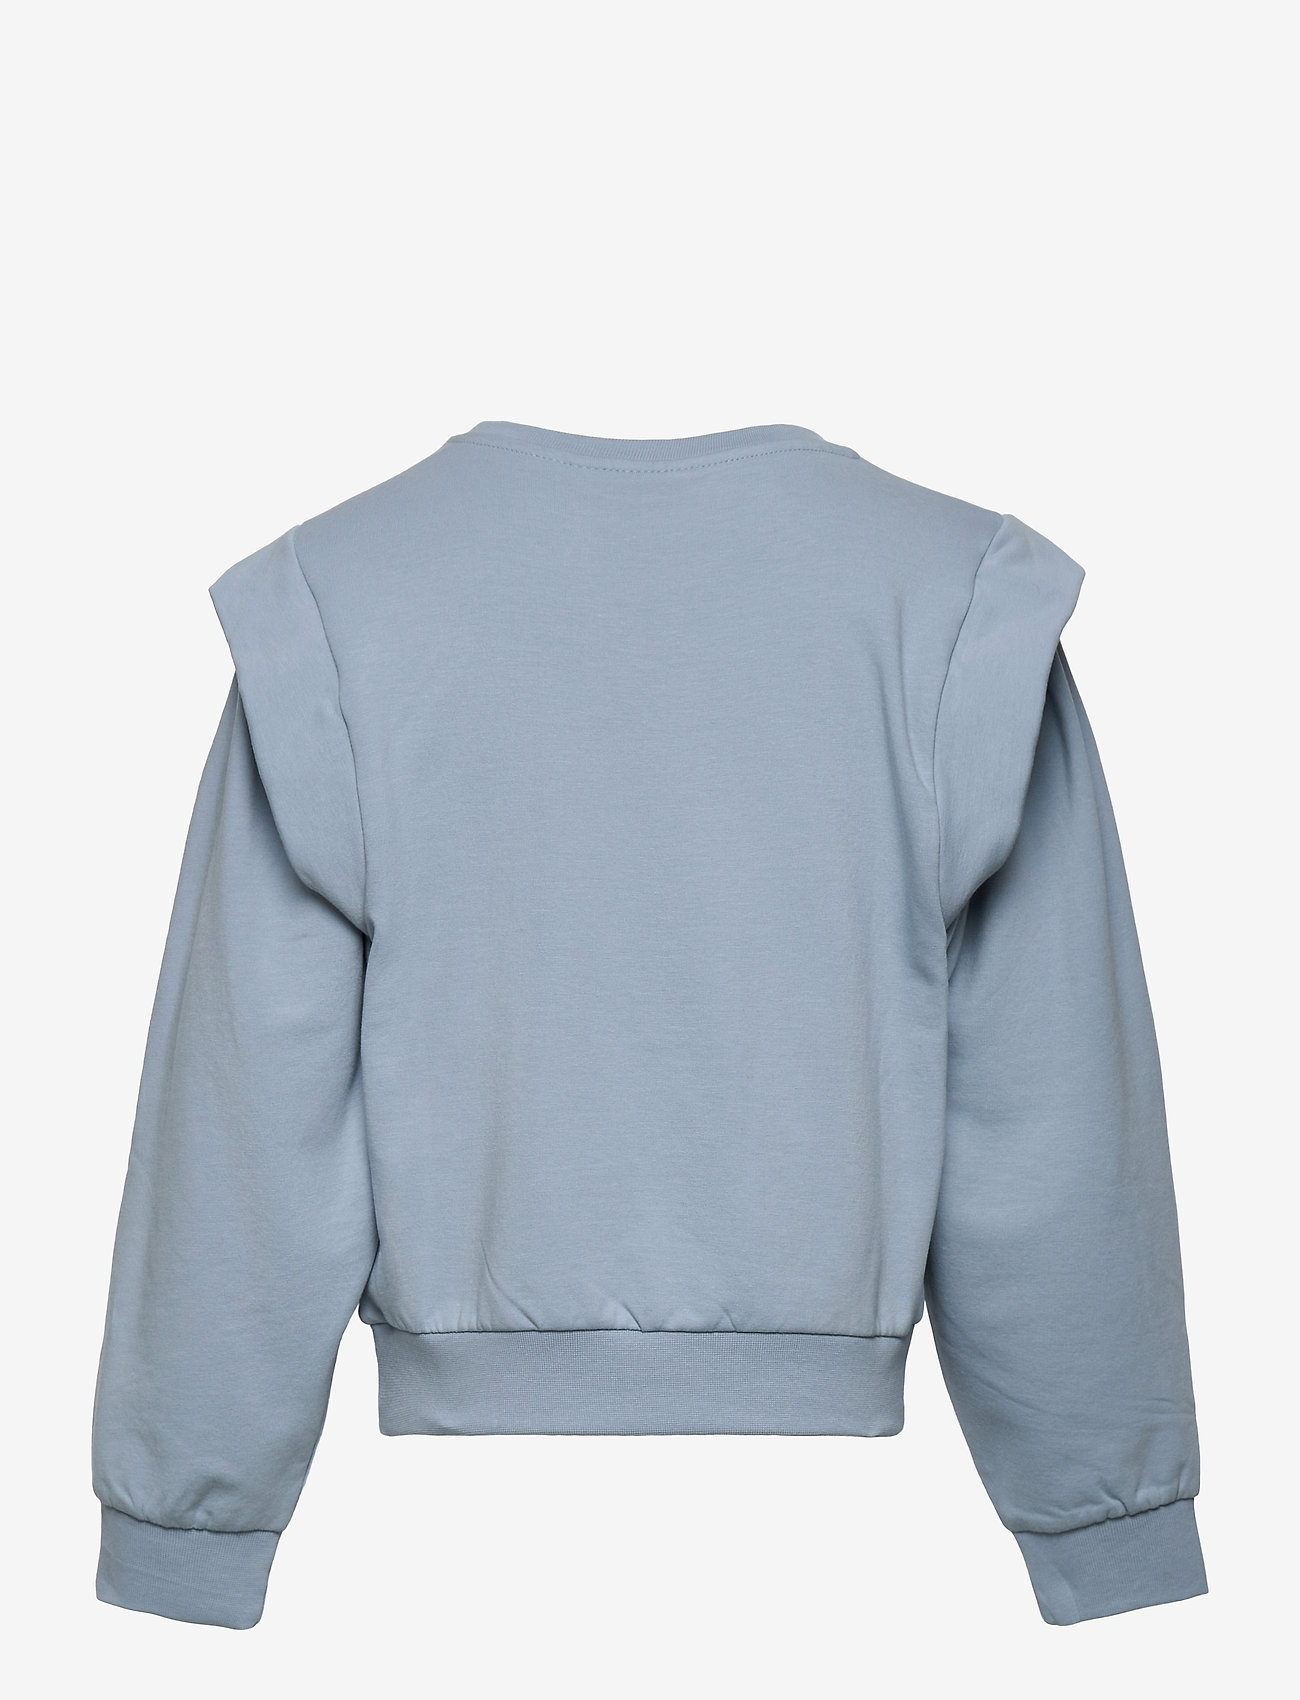 name it - NKFHOWAY LS SWEAT BRU - sweatshirts - dusty blue - 1